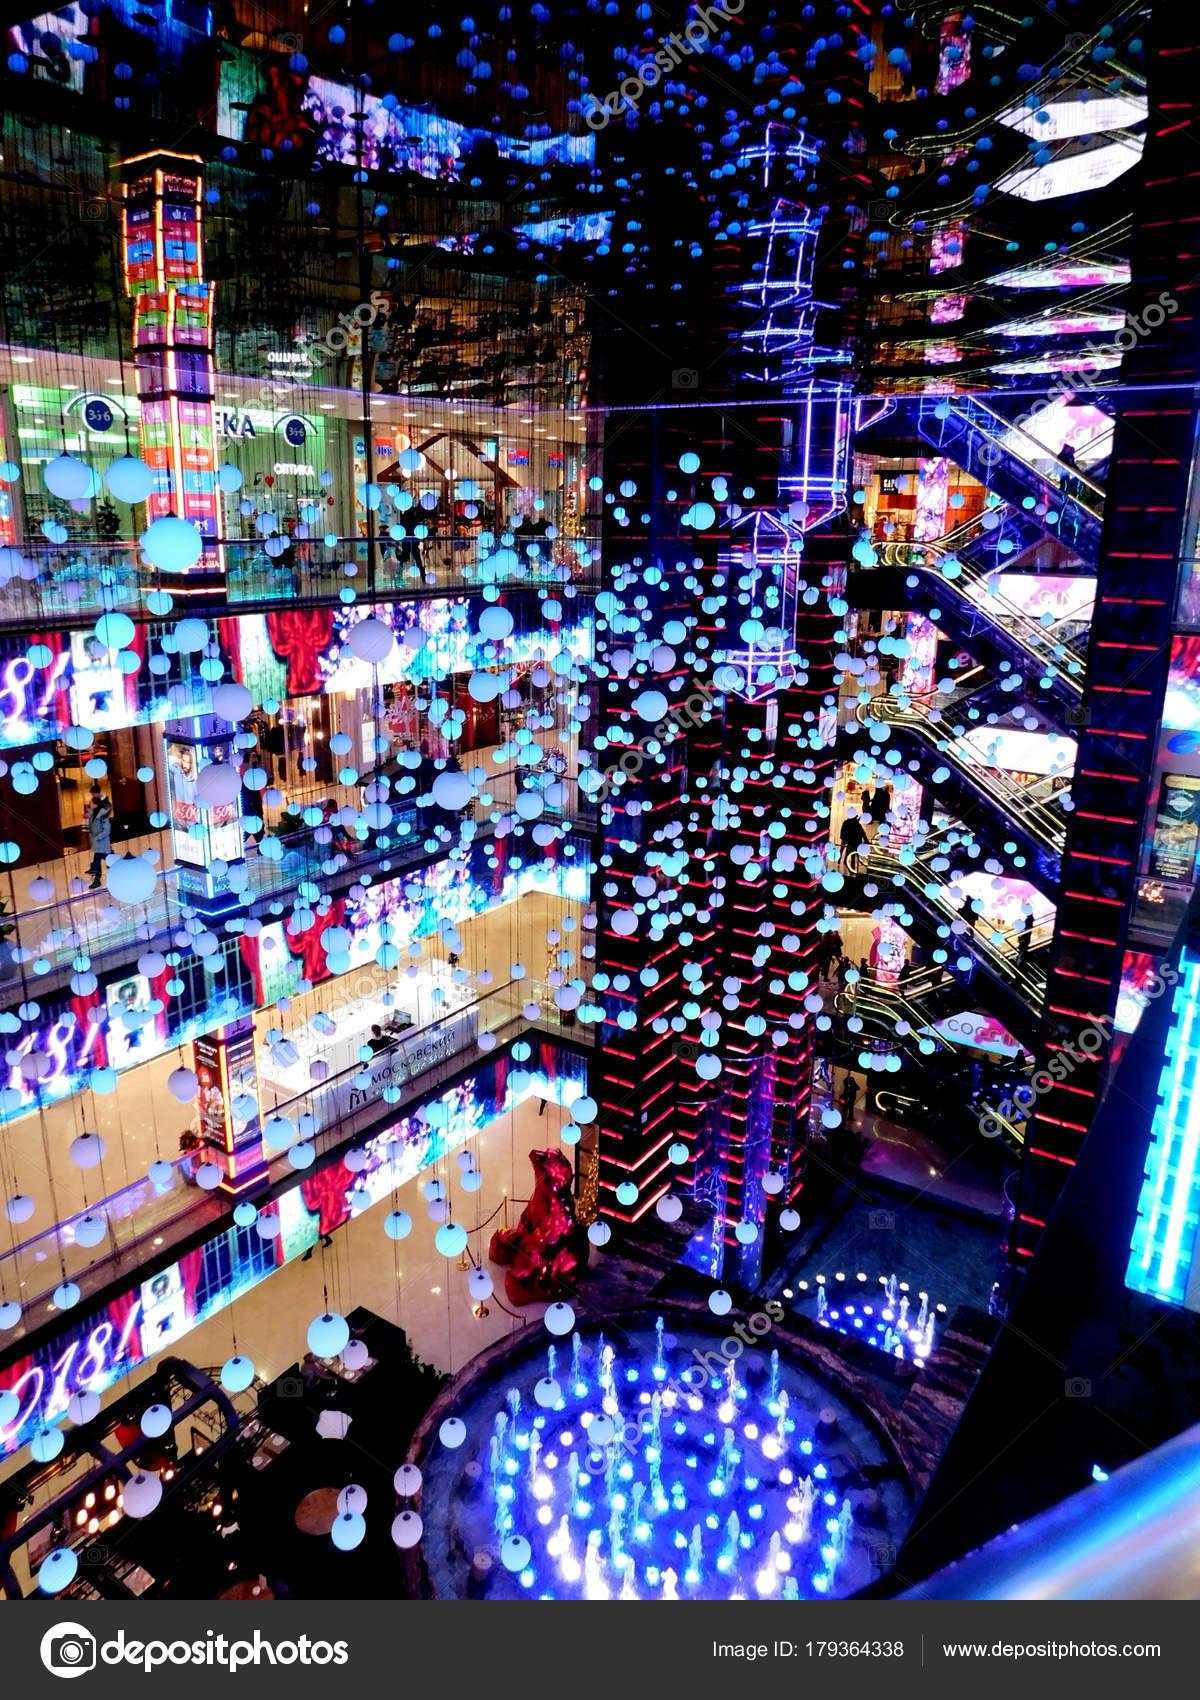 natal comercial 2018 Moscou Rússia Janeiro 2018 Europeu Evropeisky Centro Comercial  natal comercial 2018